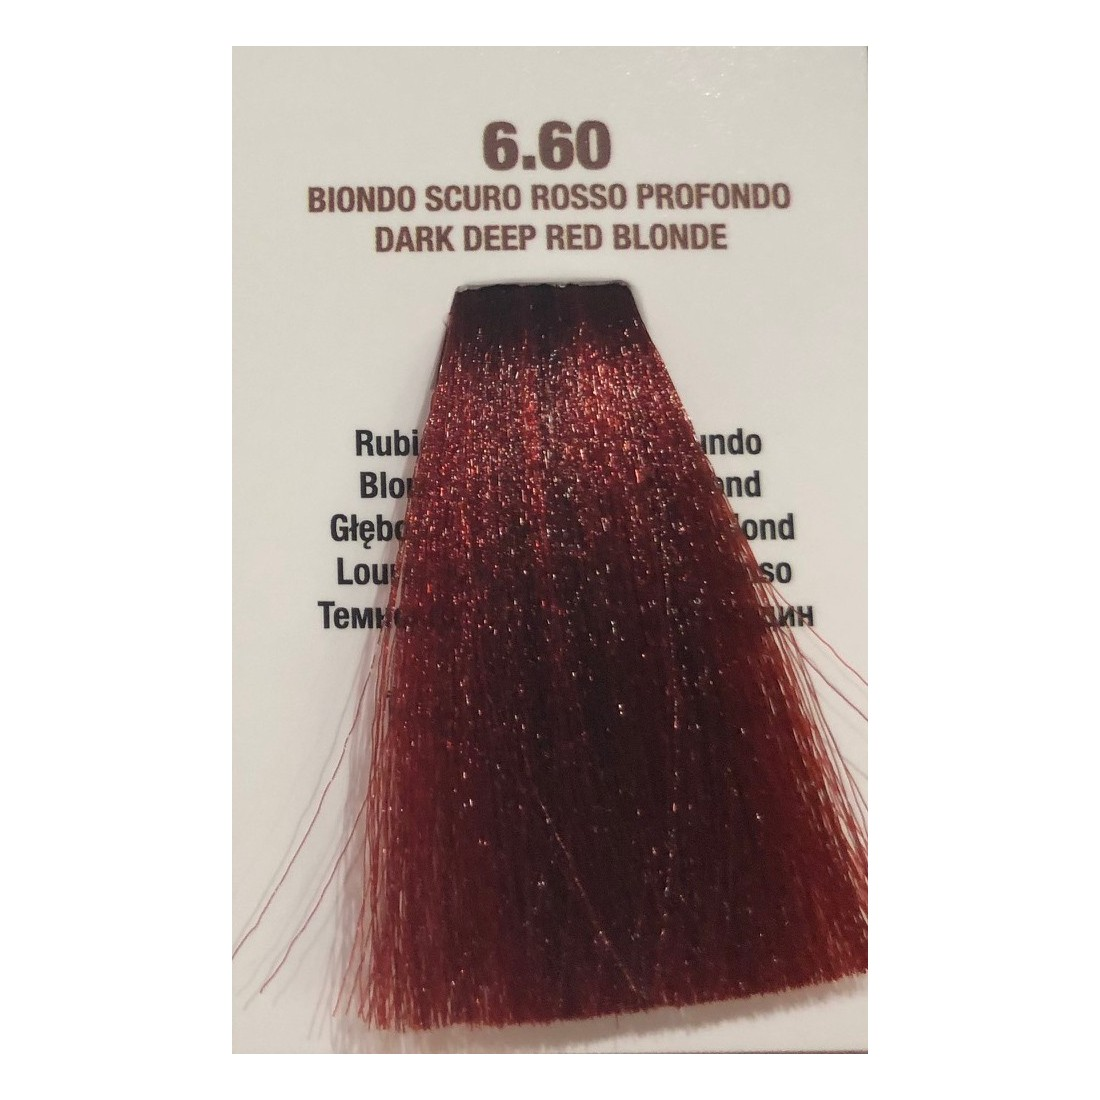 COLORATION SANS PPD - SOL.FINE - BLOND FONCE ROUGE PROFOND  N ° 6 . 60 - 100 ml